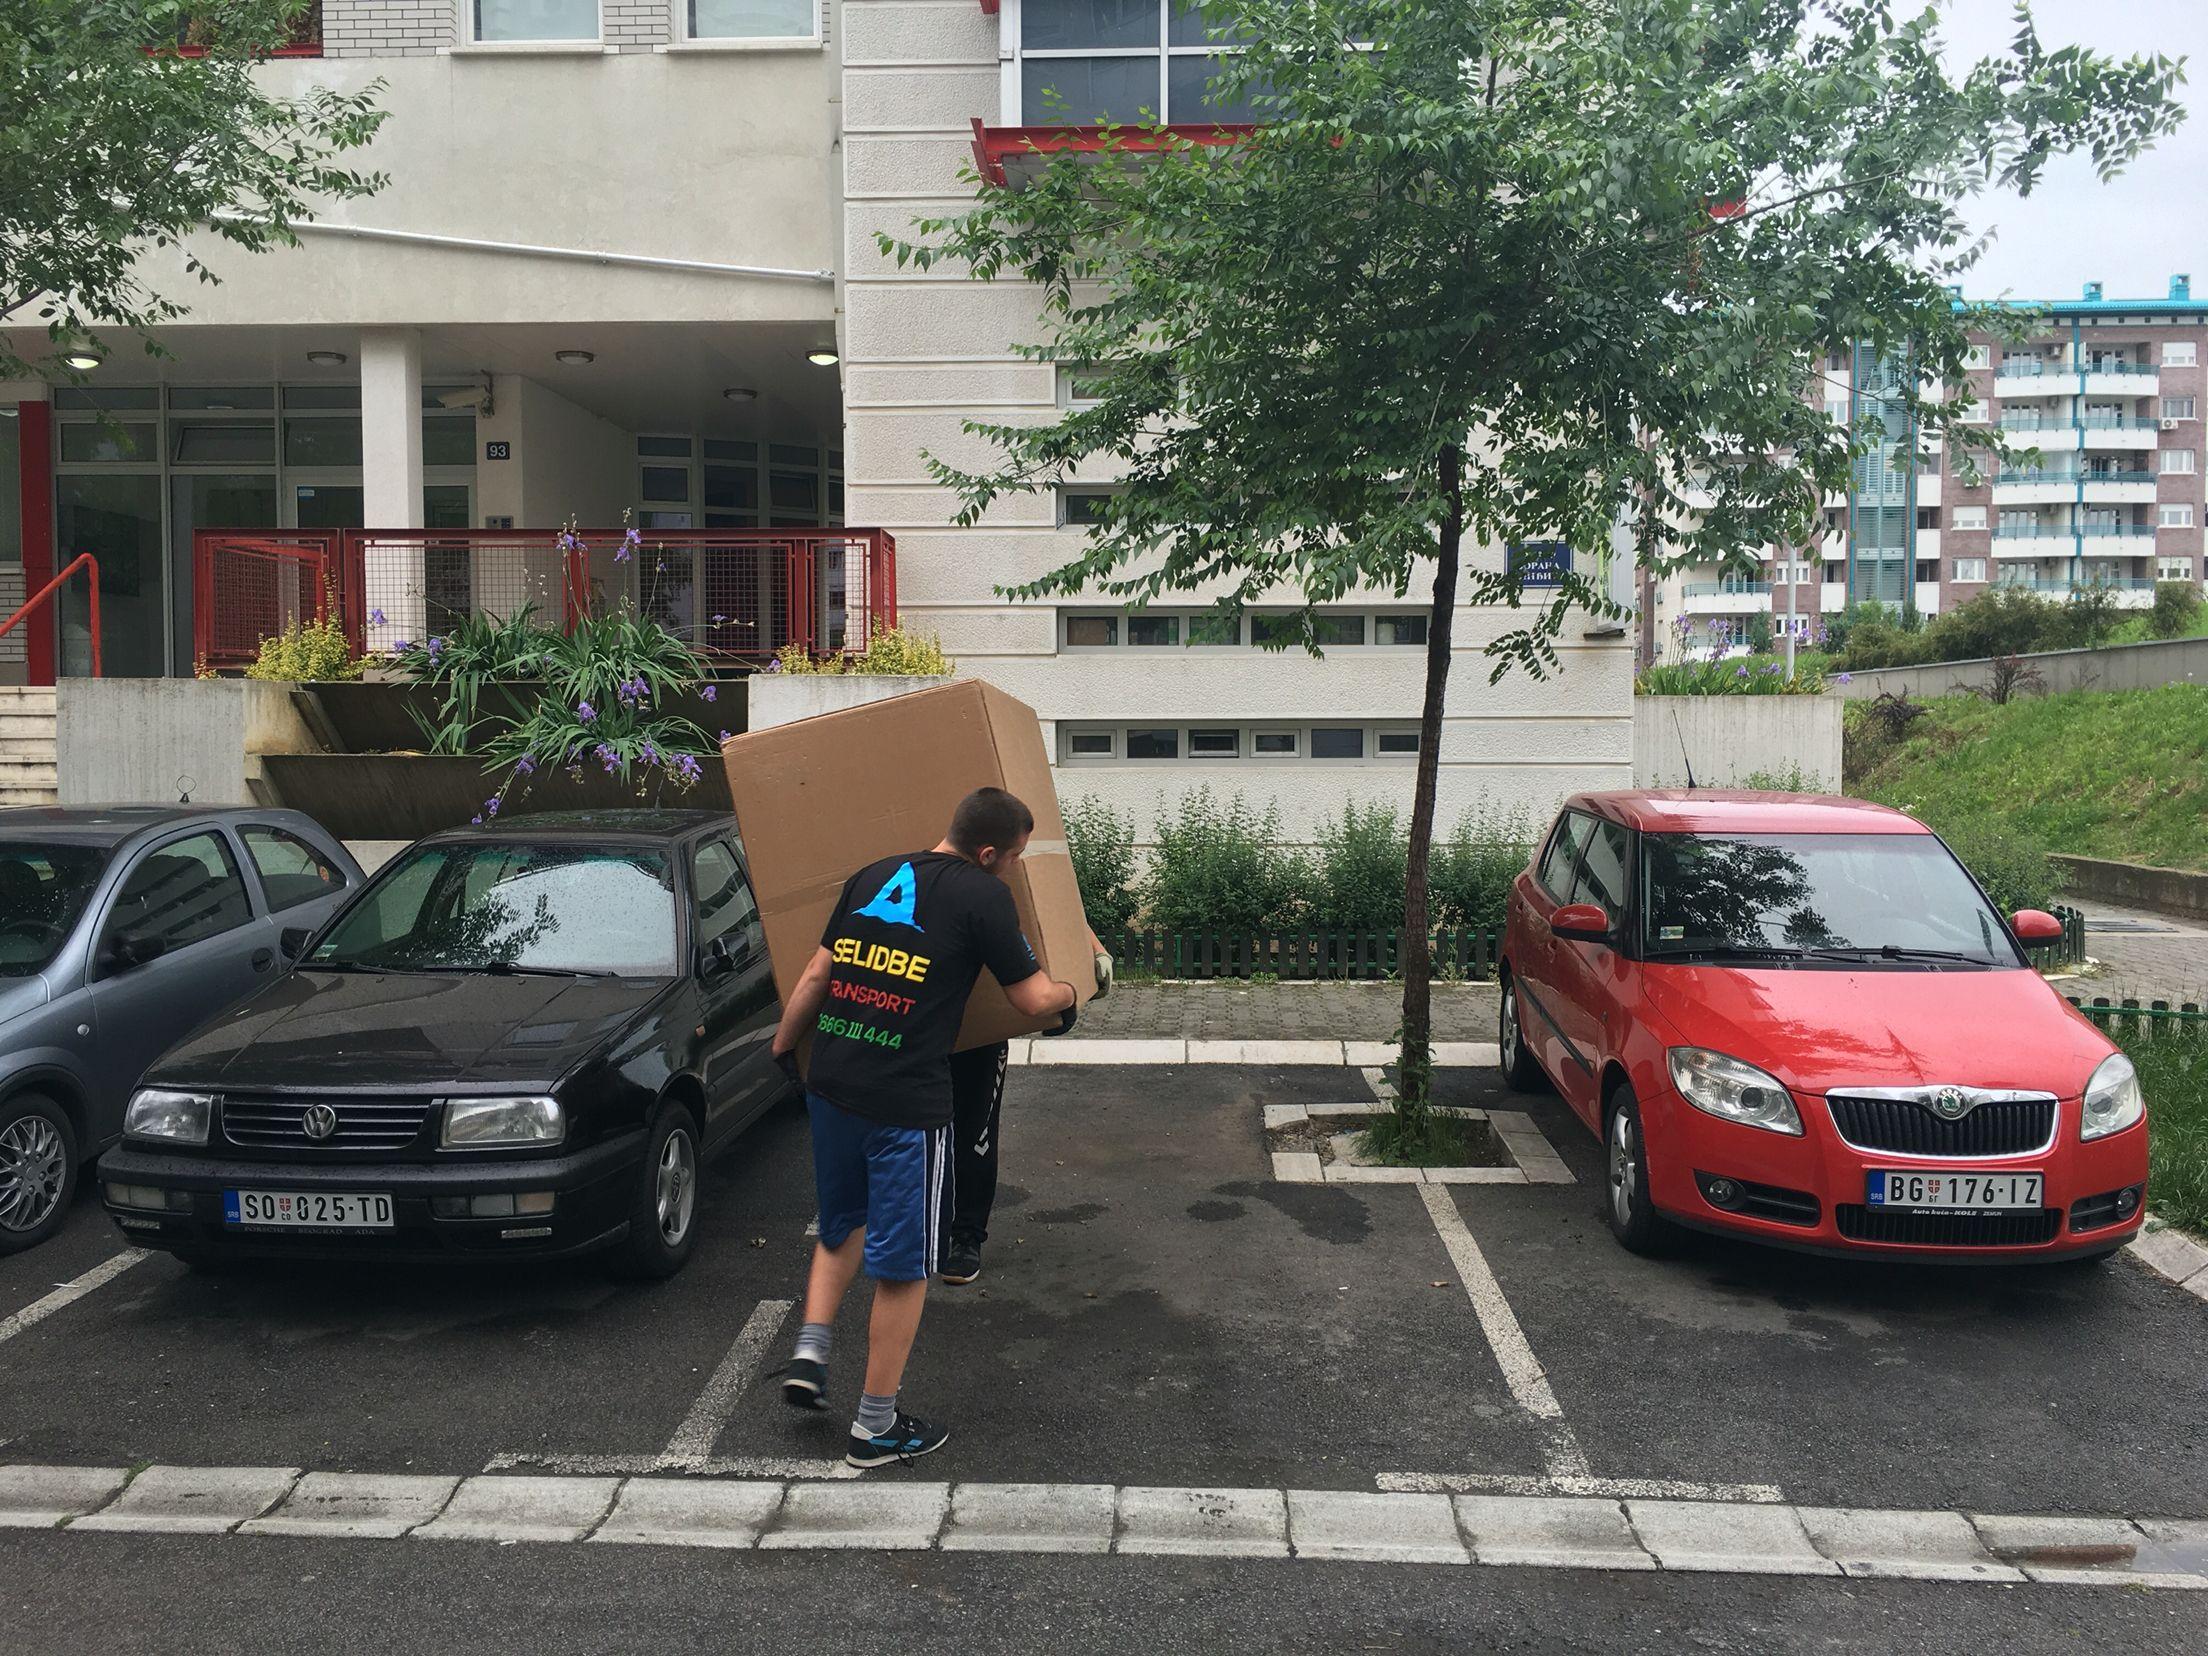 #selidbe #transport #kombiprevoz #srbija #beograd.... www.selidbeitransport.rs 066/6-111-444